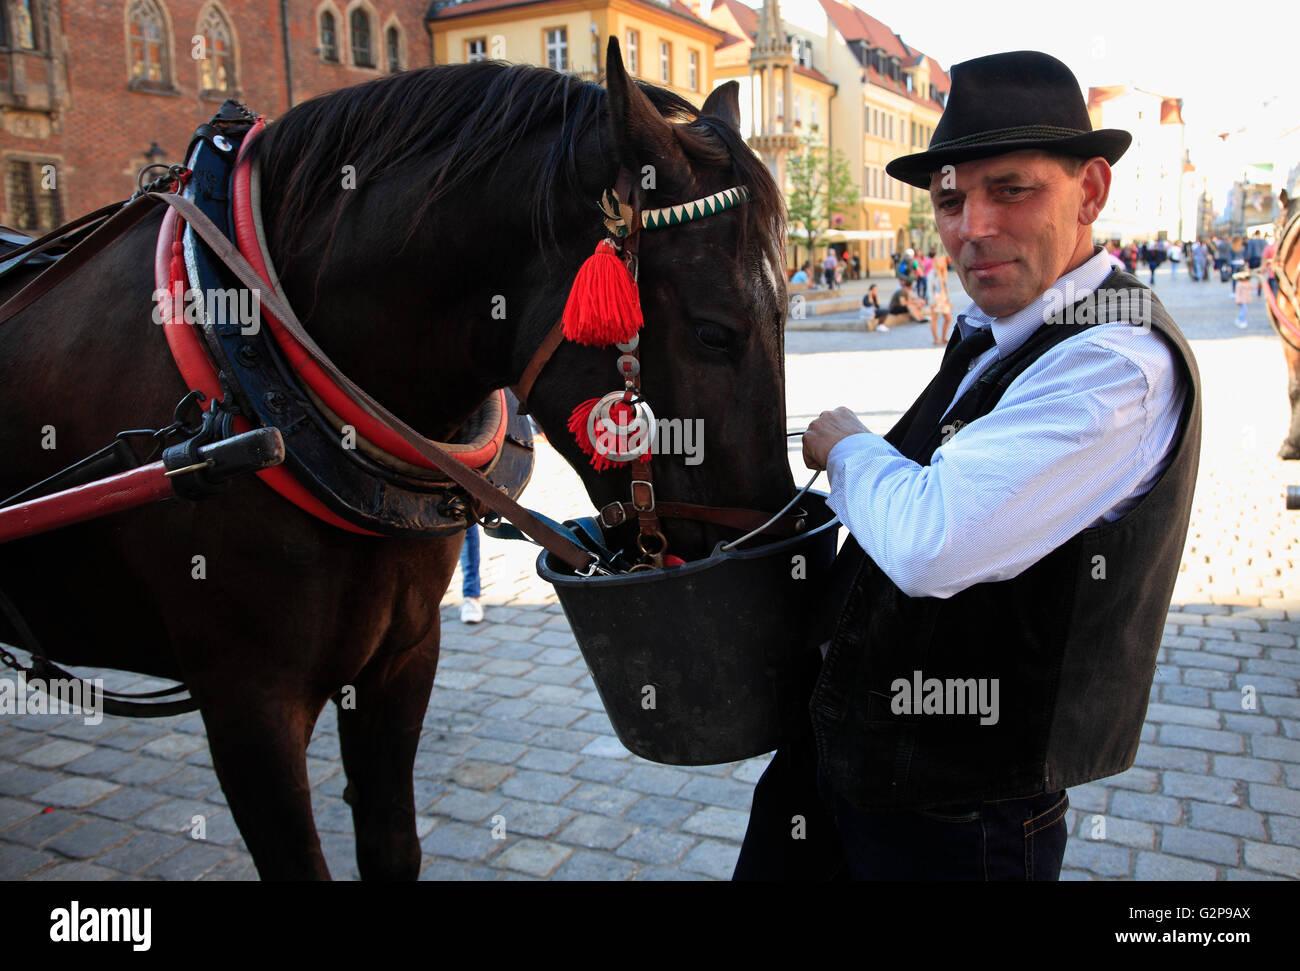 Carriage horse at Market square Rynek, Wroclaw, Silesia, Poland, Europe - Stock Image